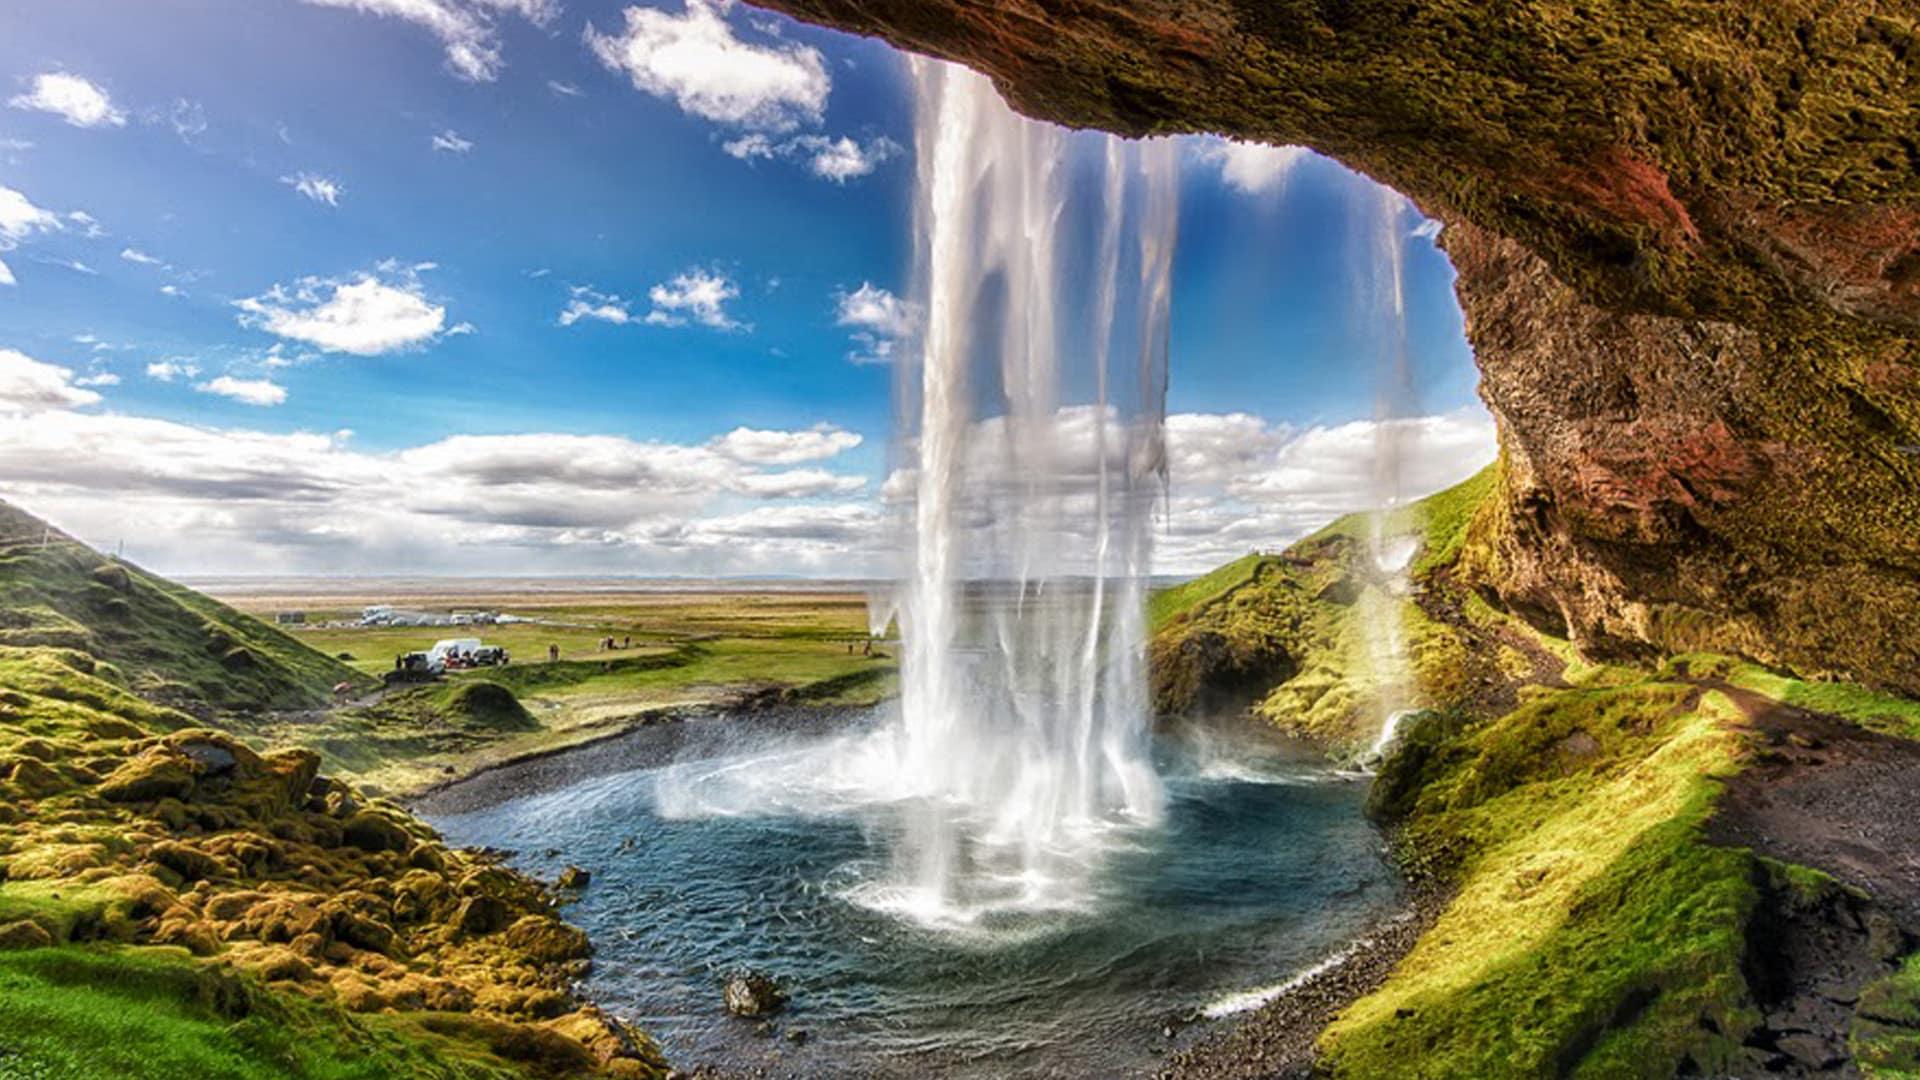 Wallpaper Hd 4k Walk Behind Seljalandsfoss Waterfall